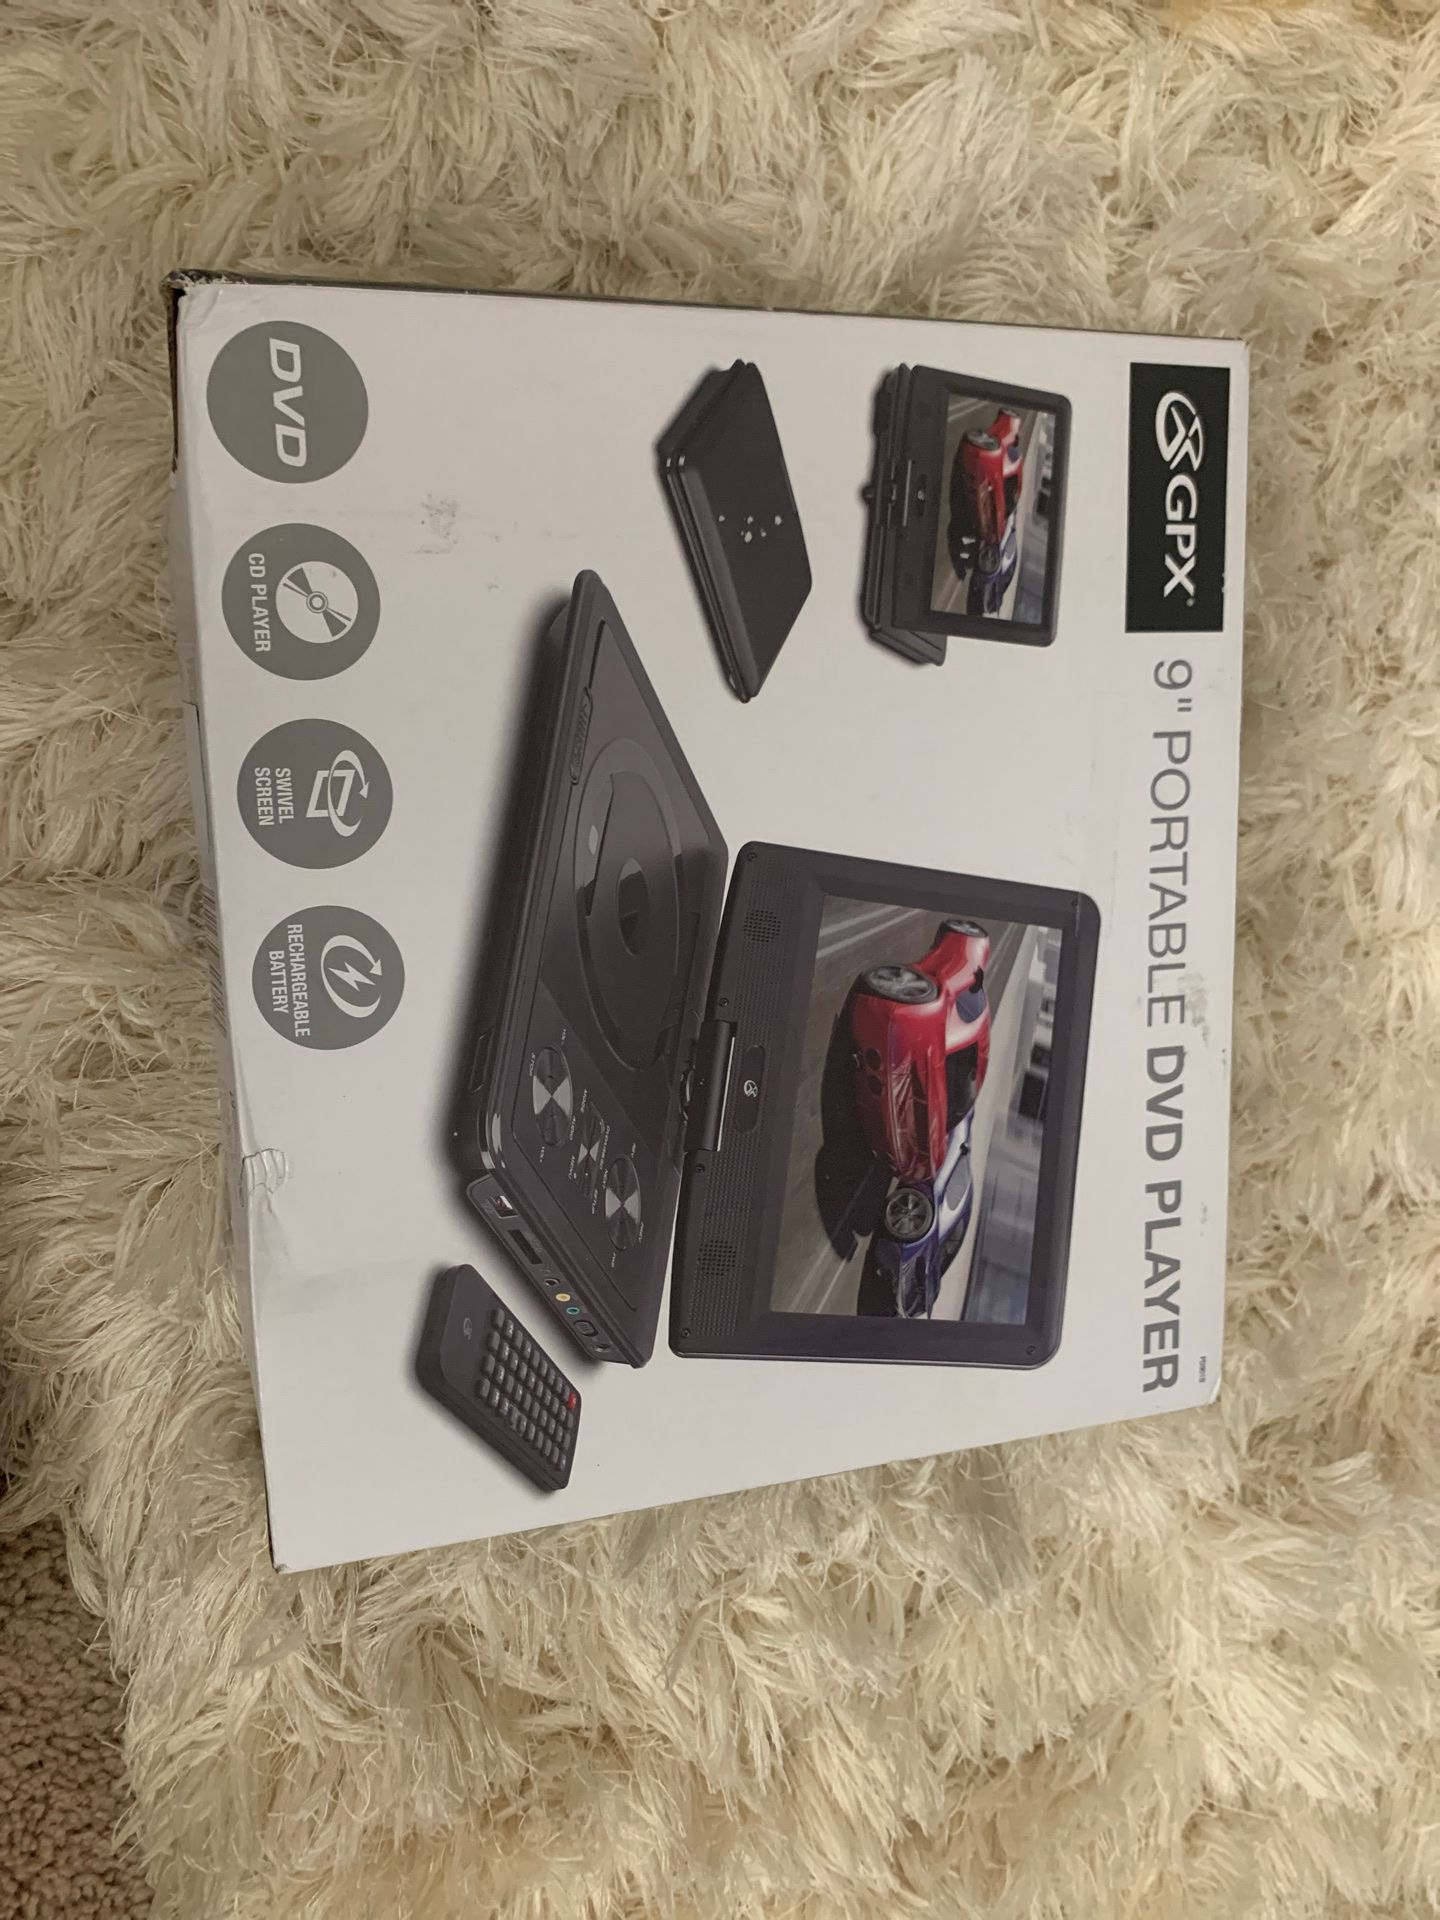 GPX 9 Portable DVD player